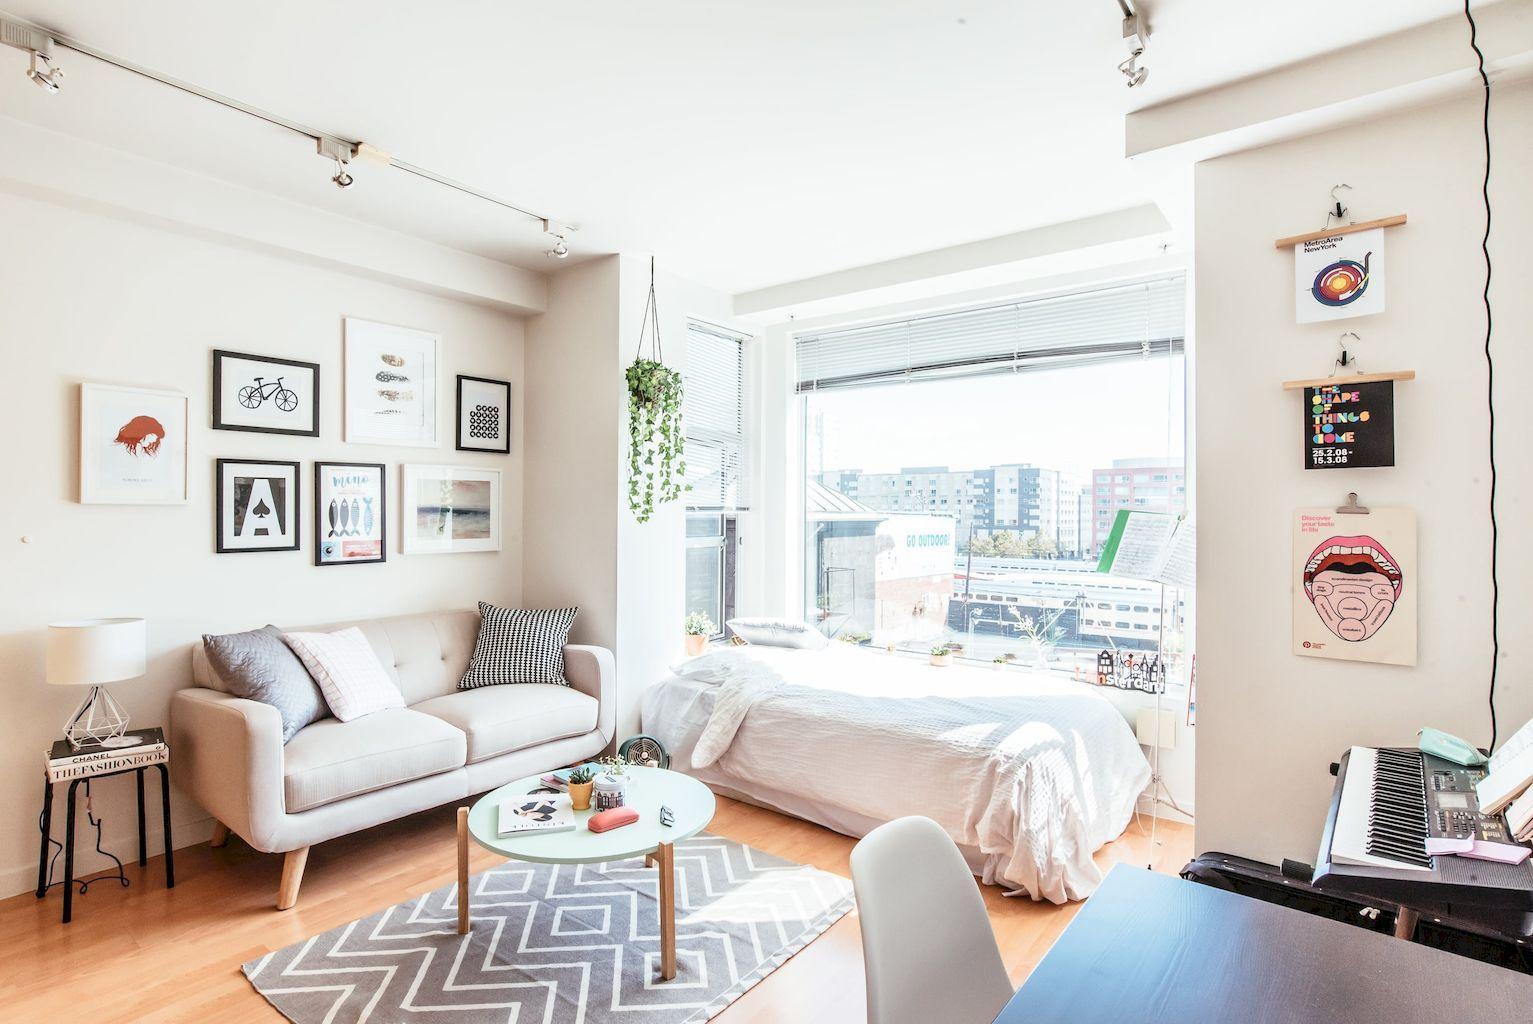 80 Small Apartment Studio Decorating Ideas | Apartments, Stylish and ...